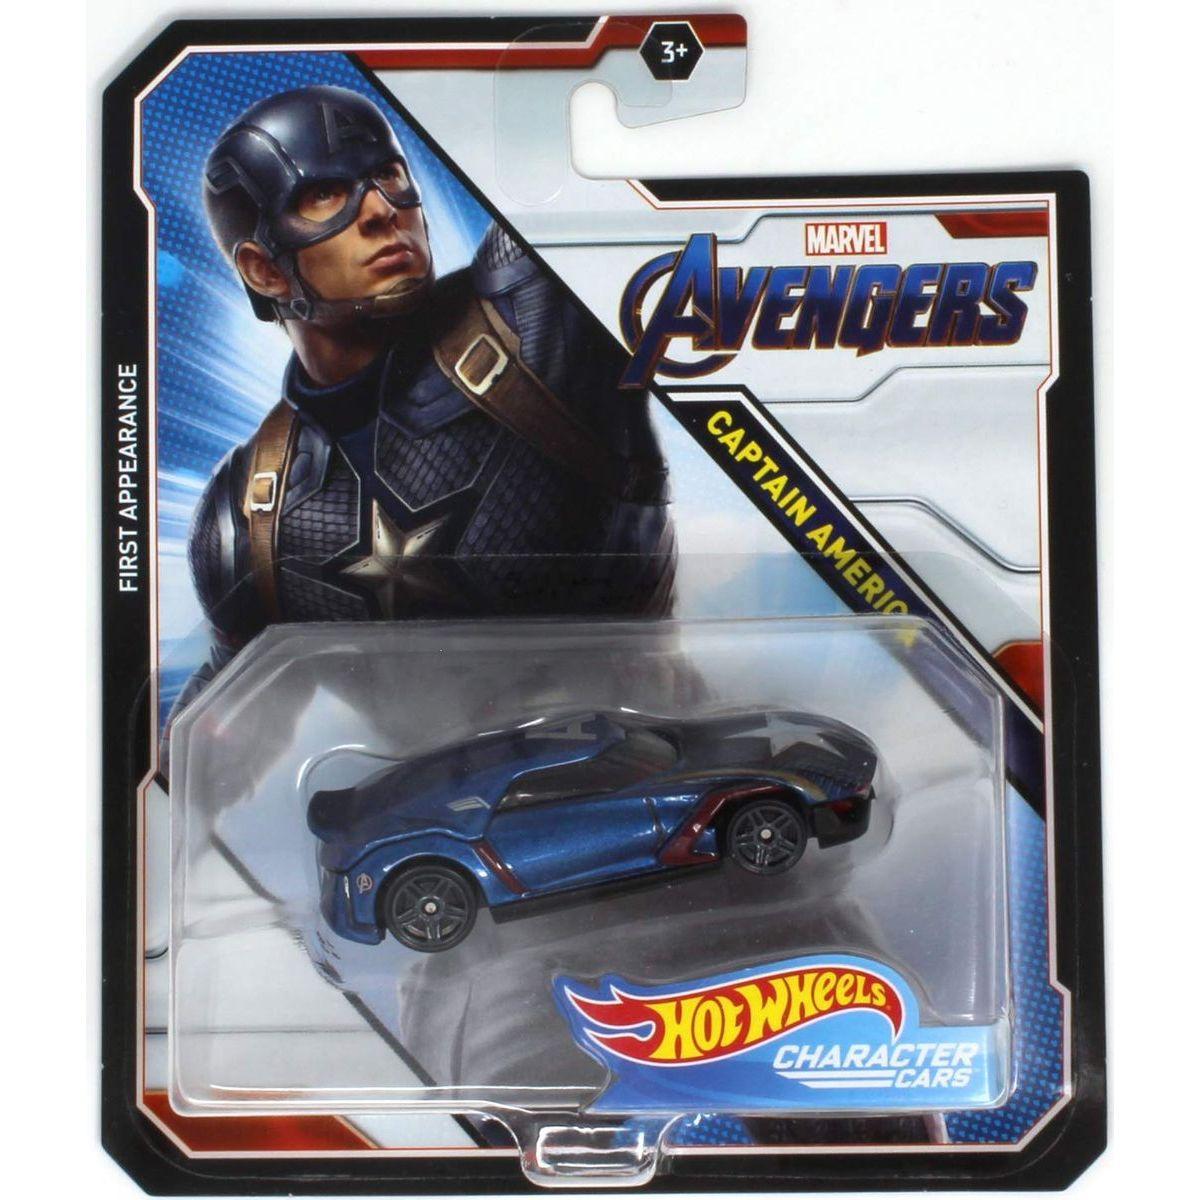 Hot Wheels Marvel Character Cars Captain America